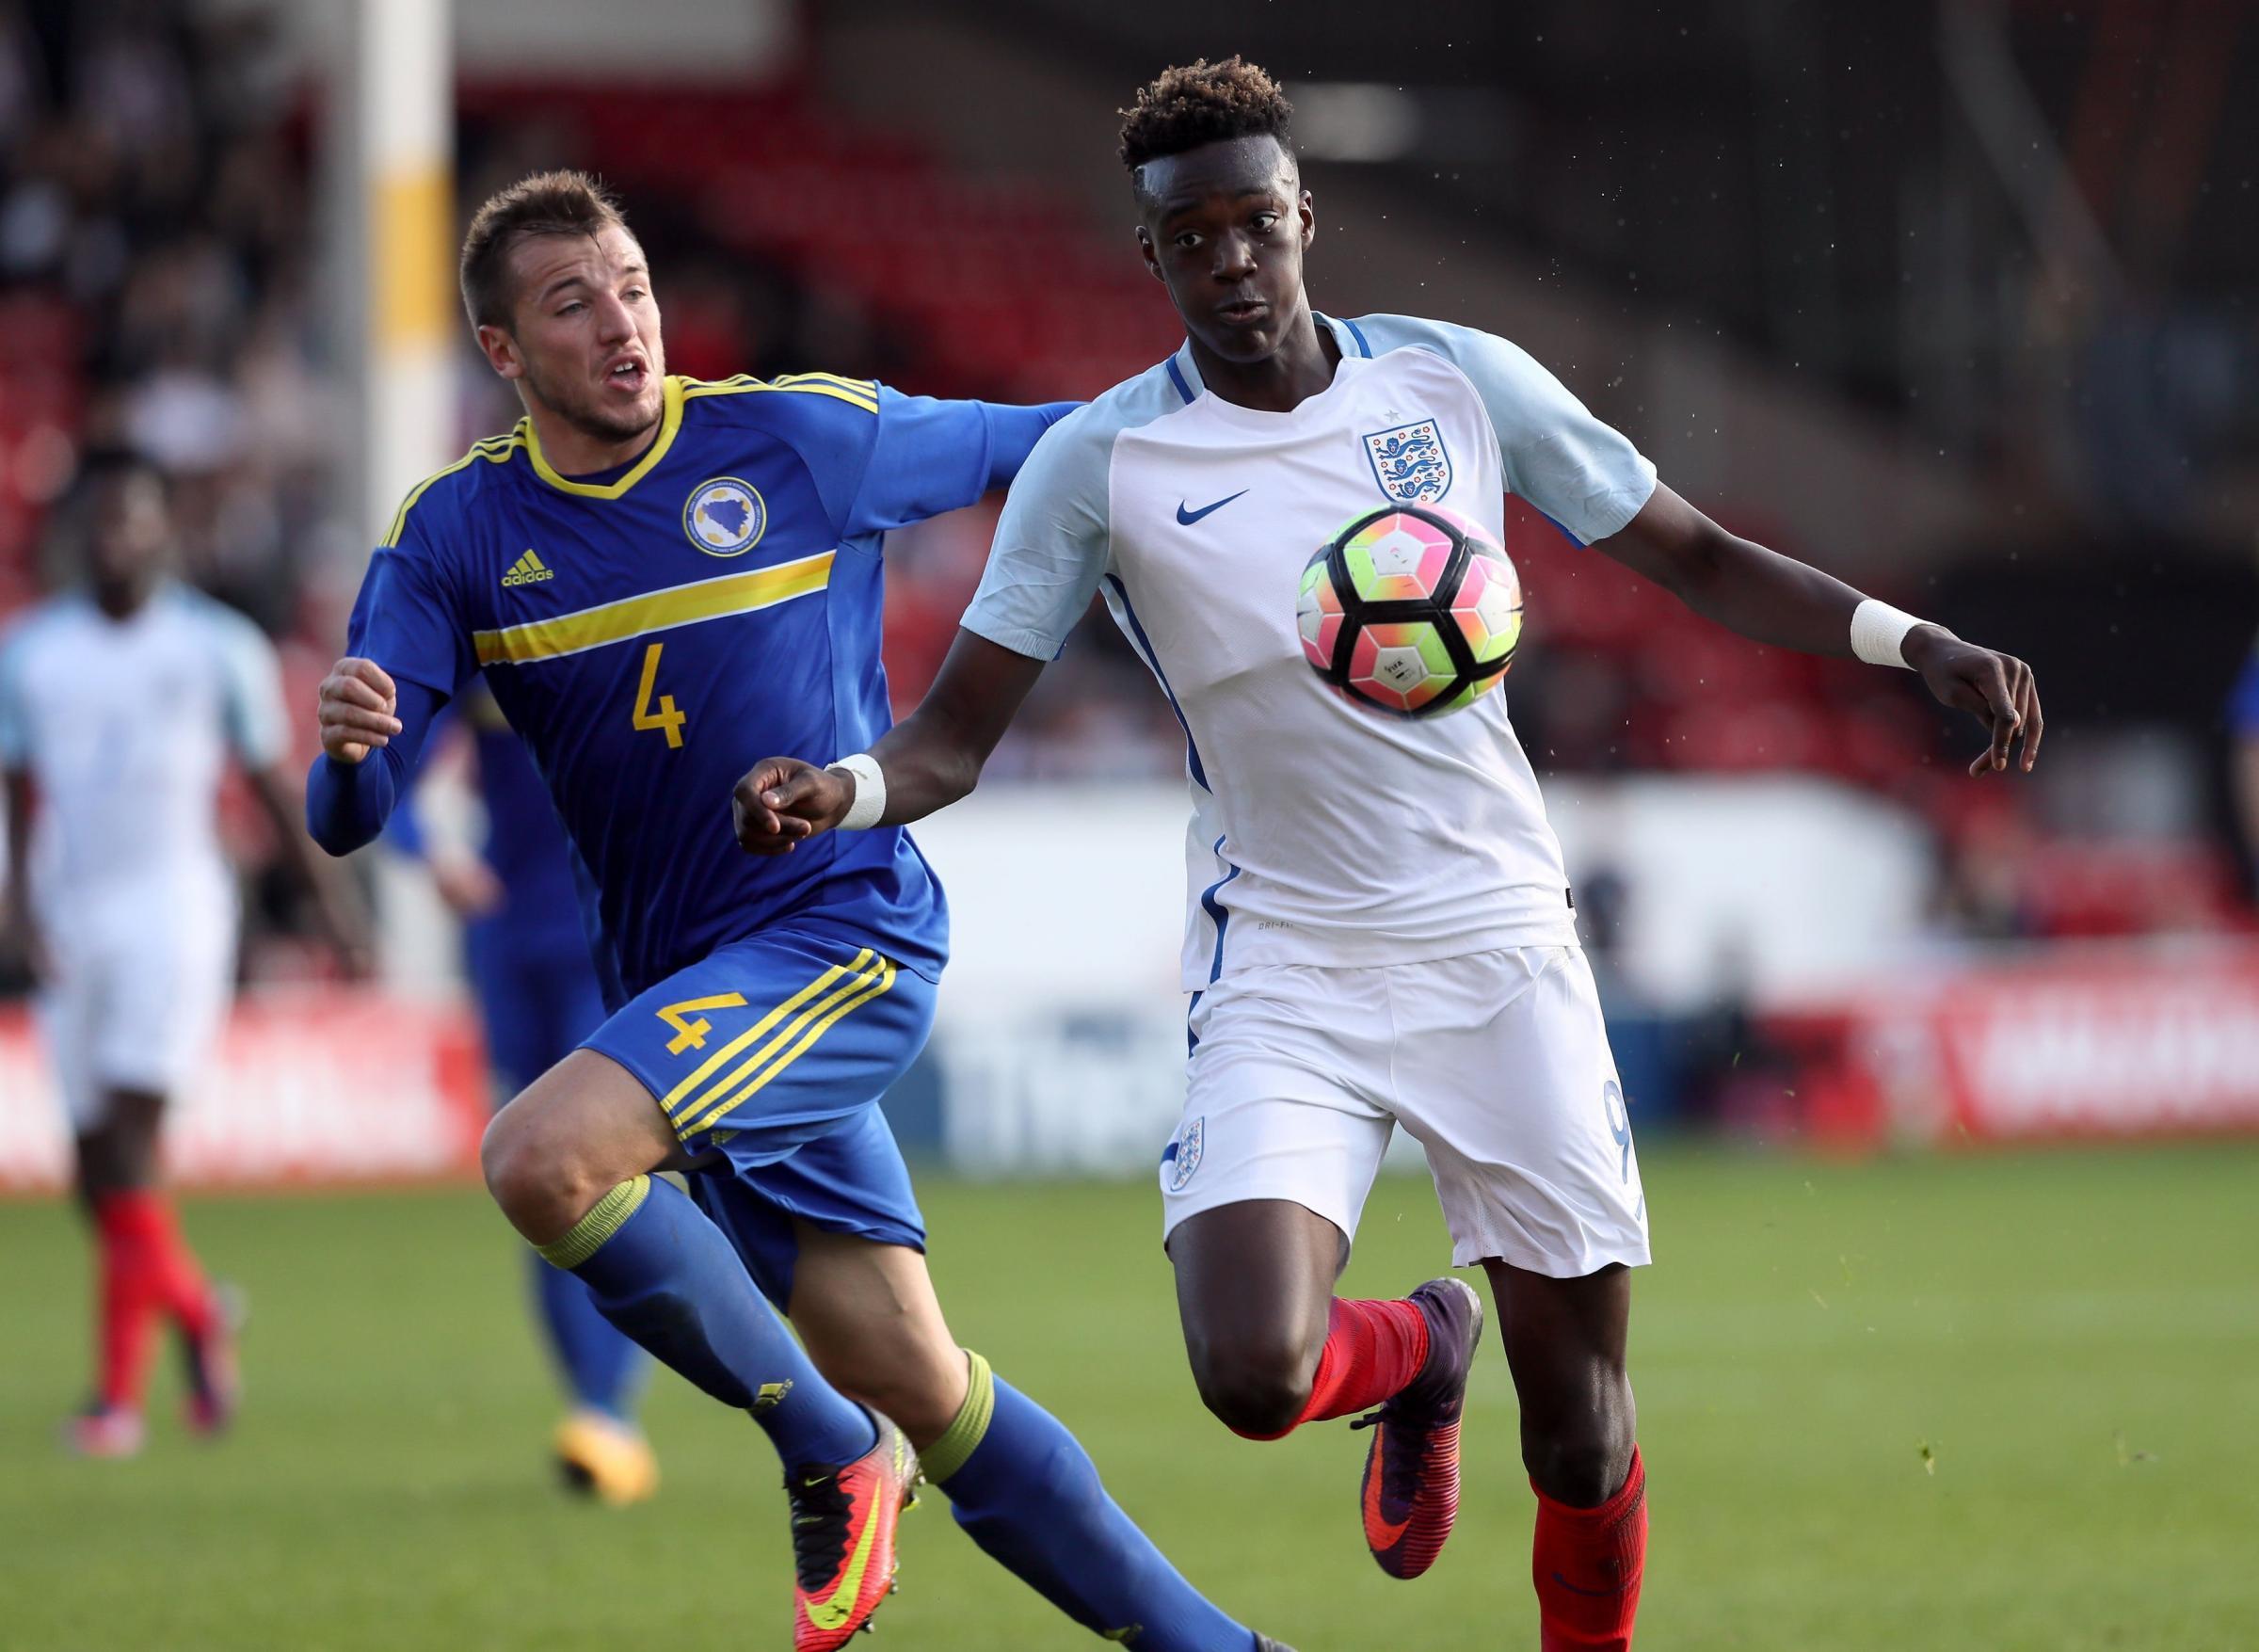 Brighton chief Barber confirms interest in Chelsea striker Abraham